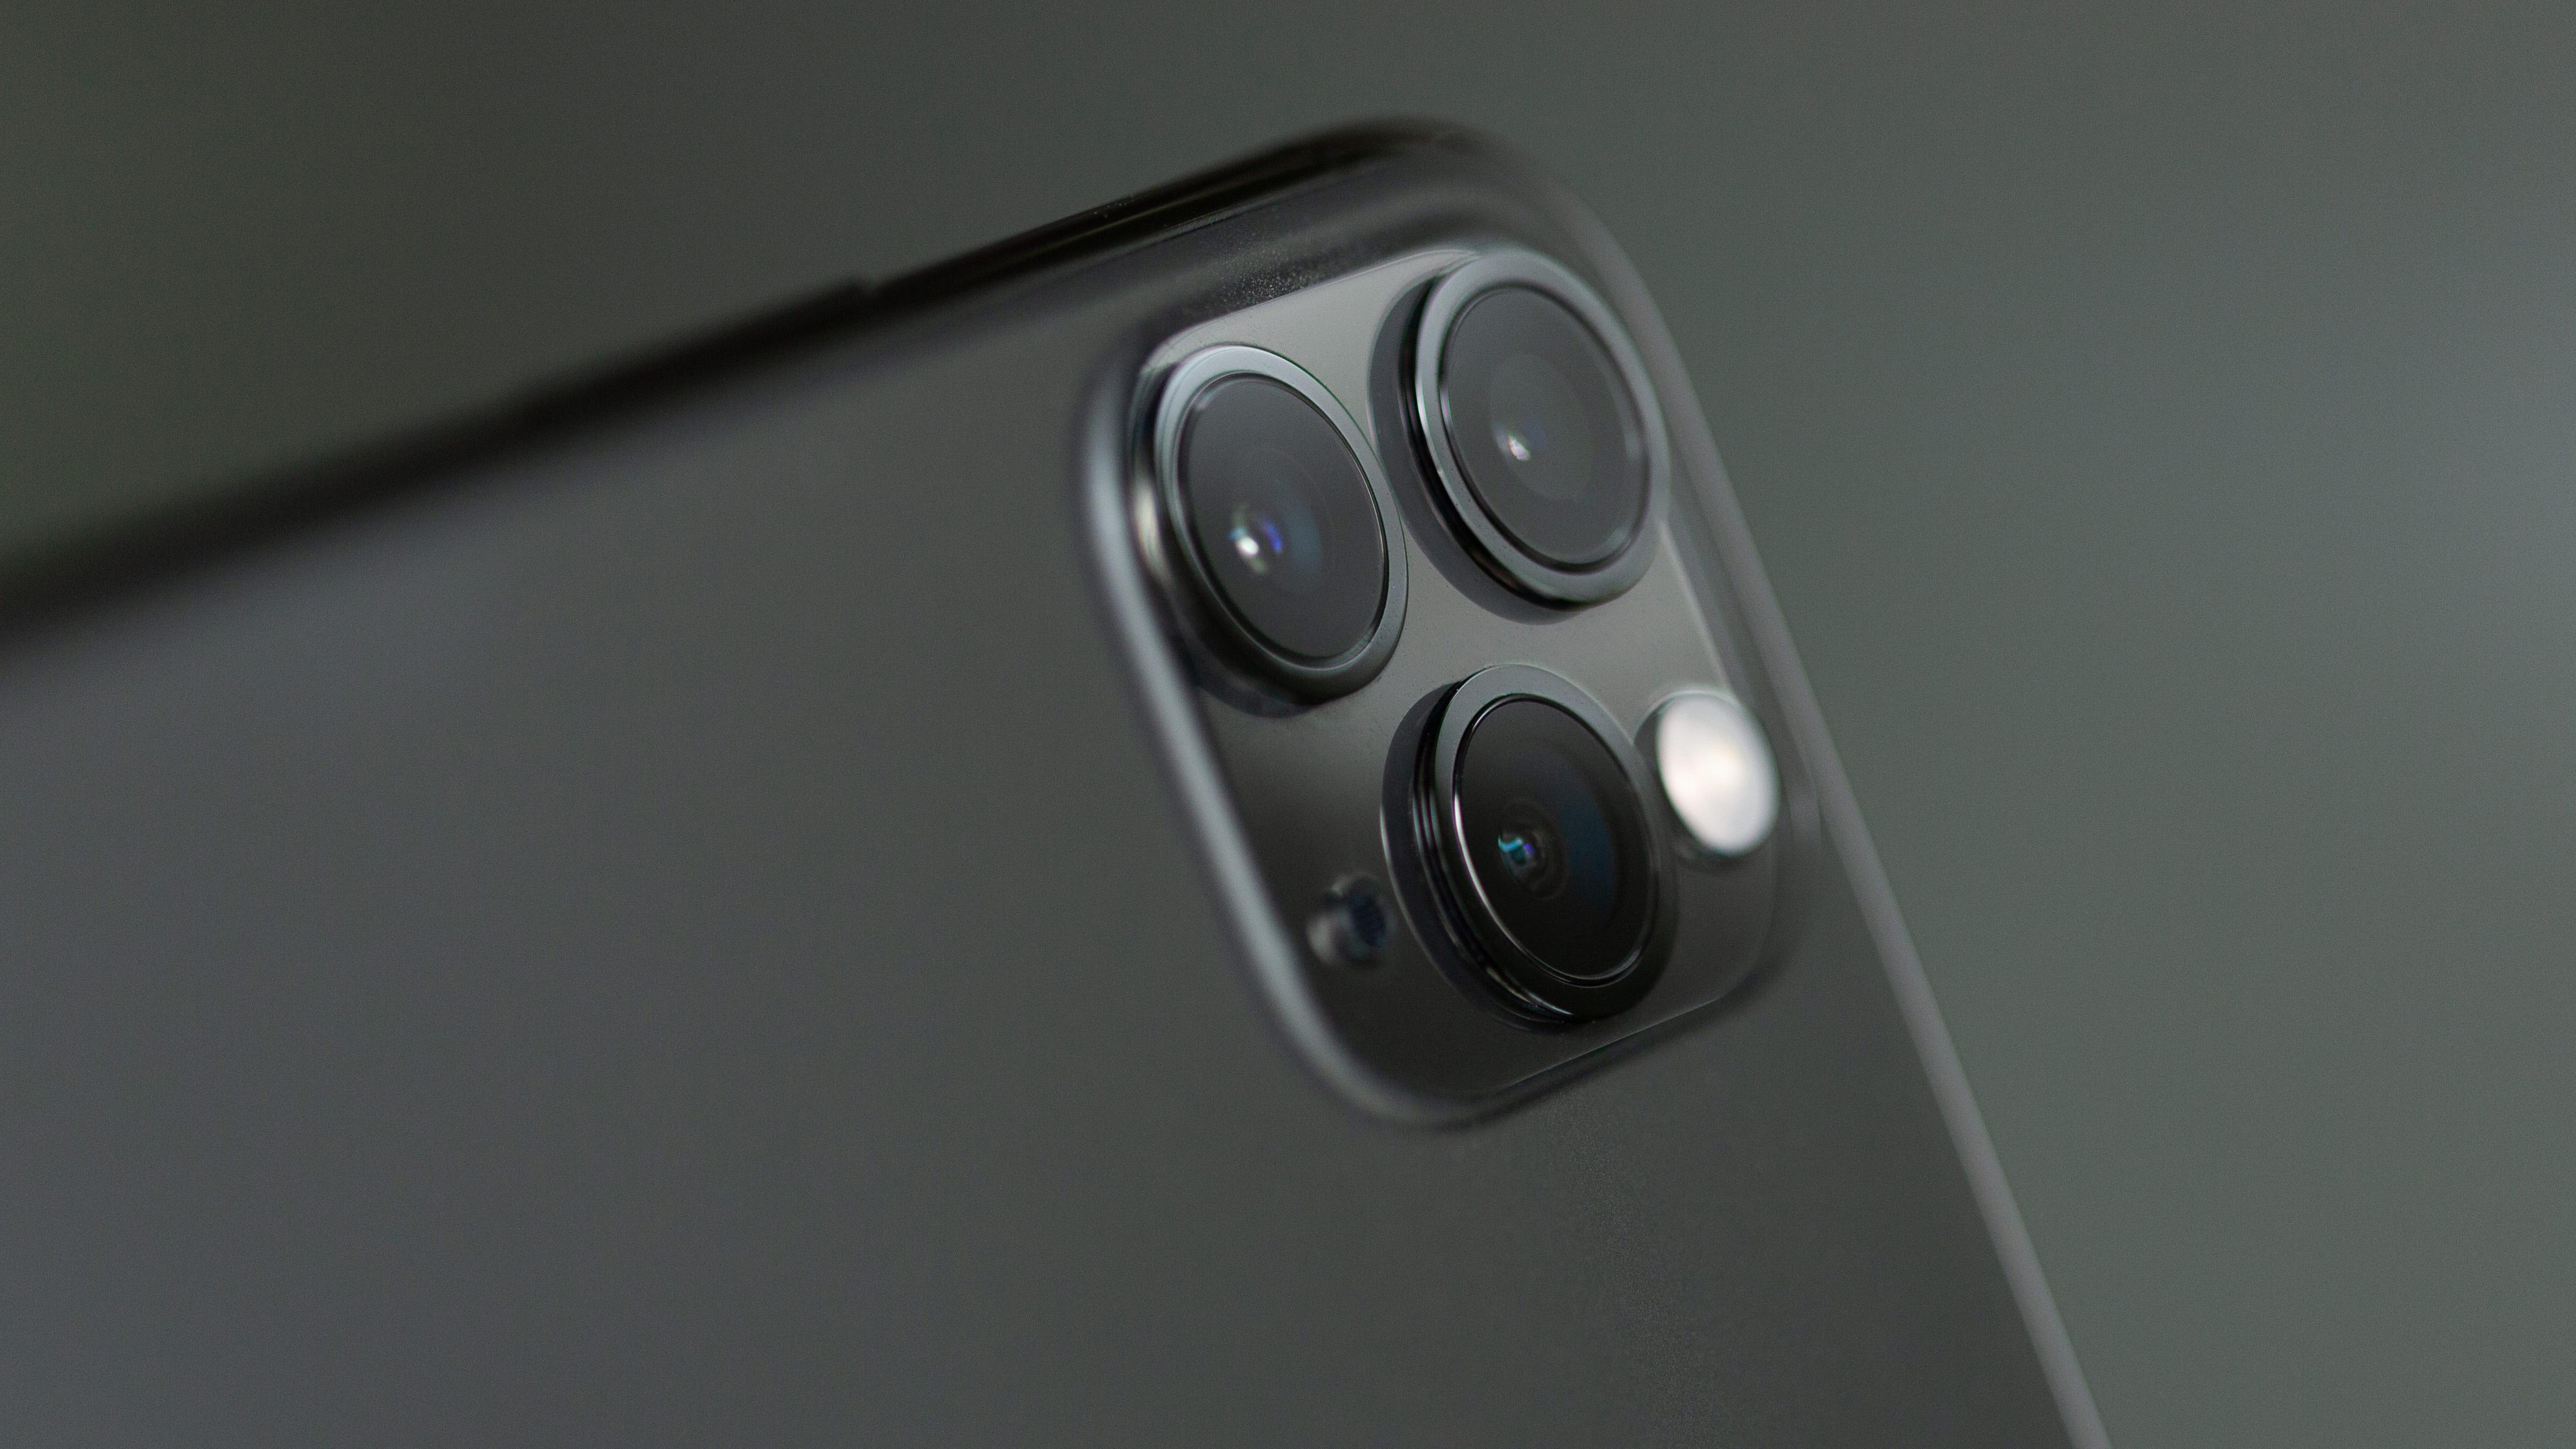 Example of smartphone multi-cam setup